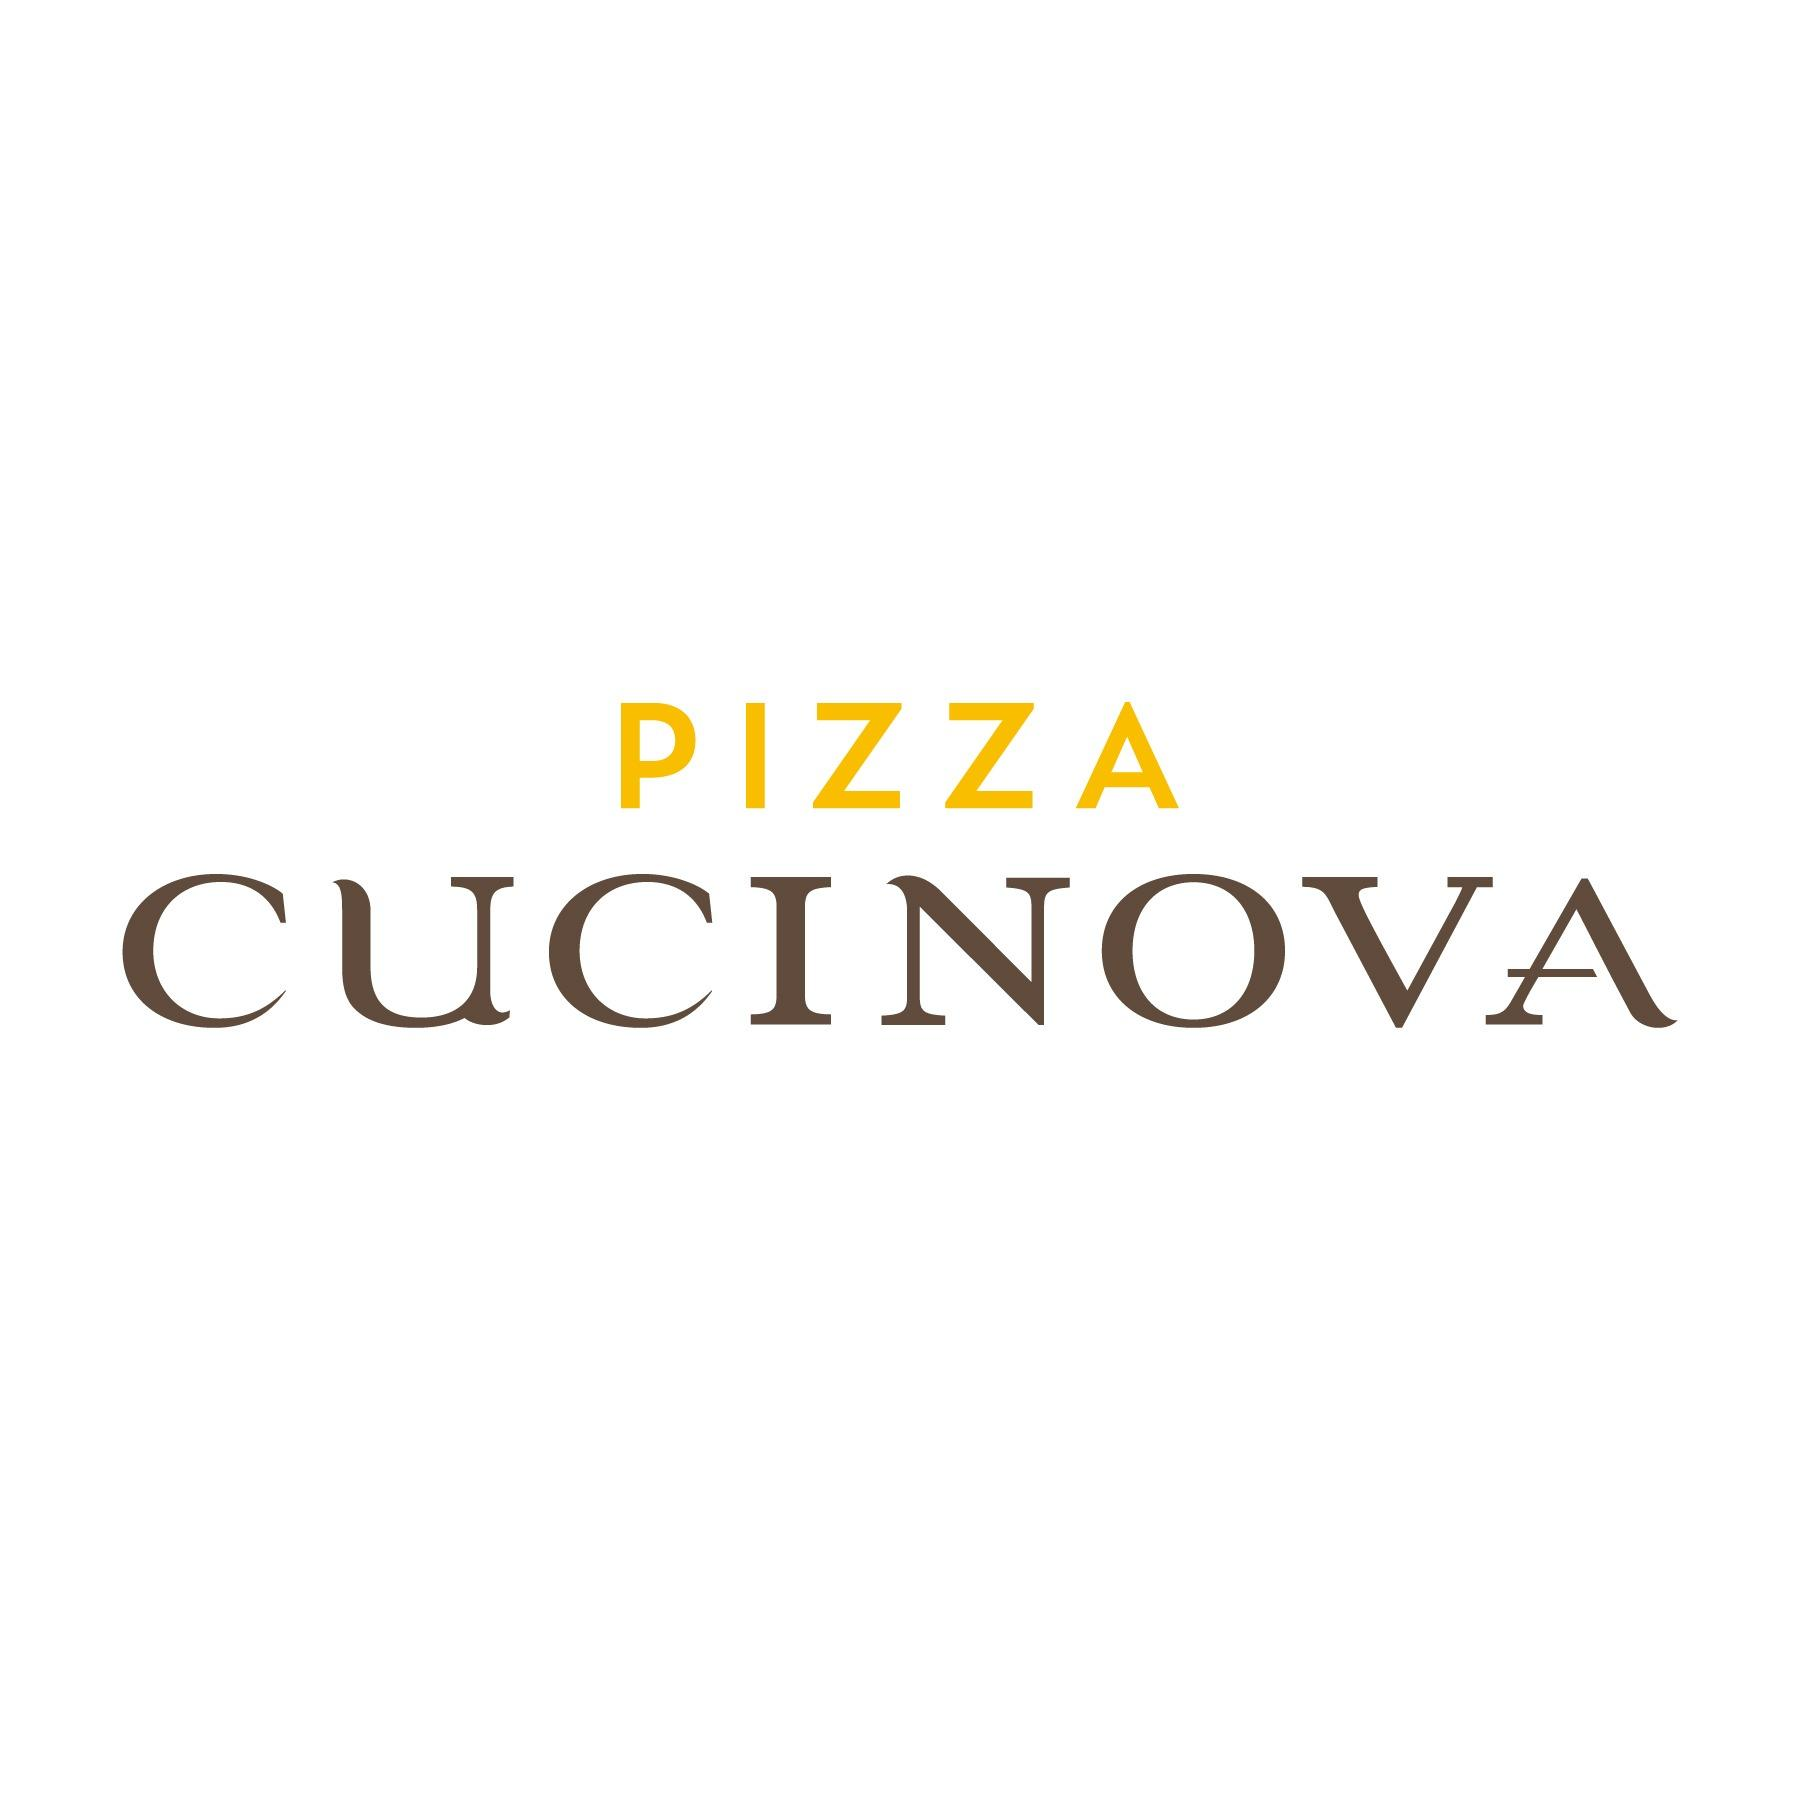 Pizza Cucinova image 10